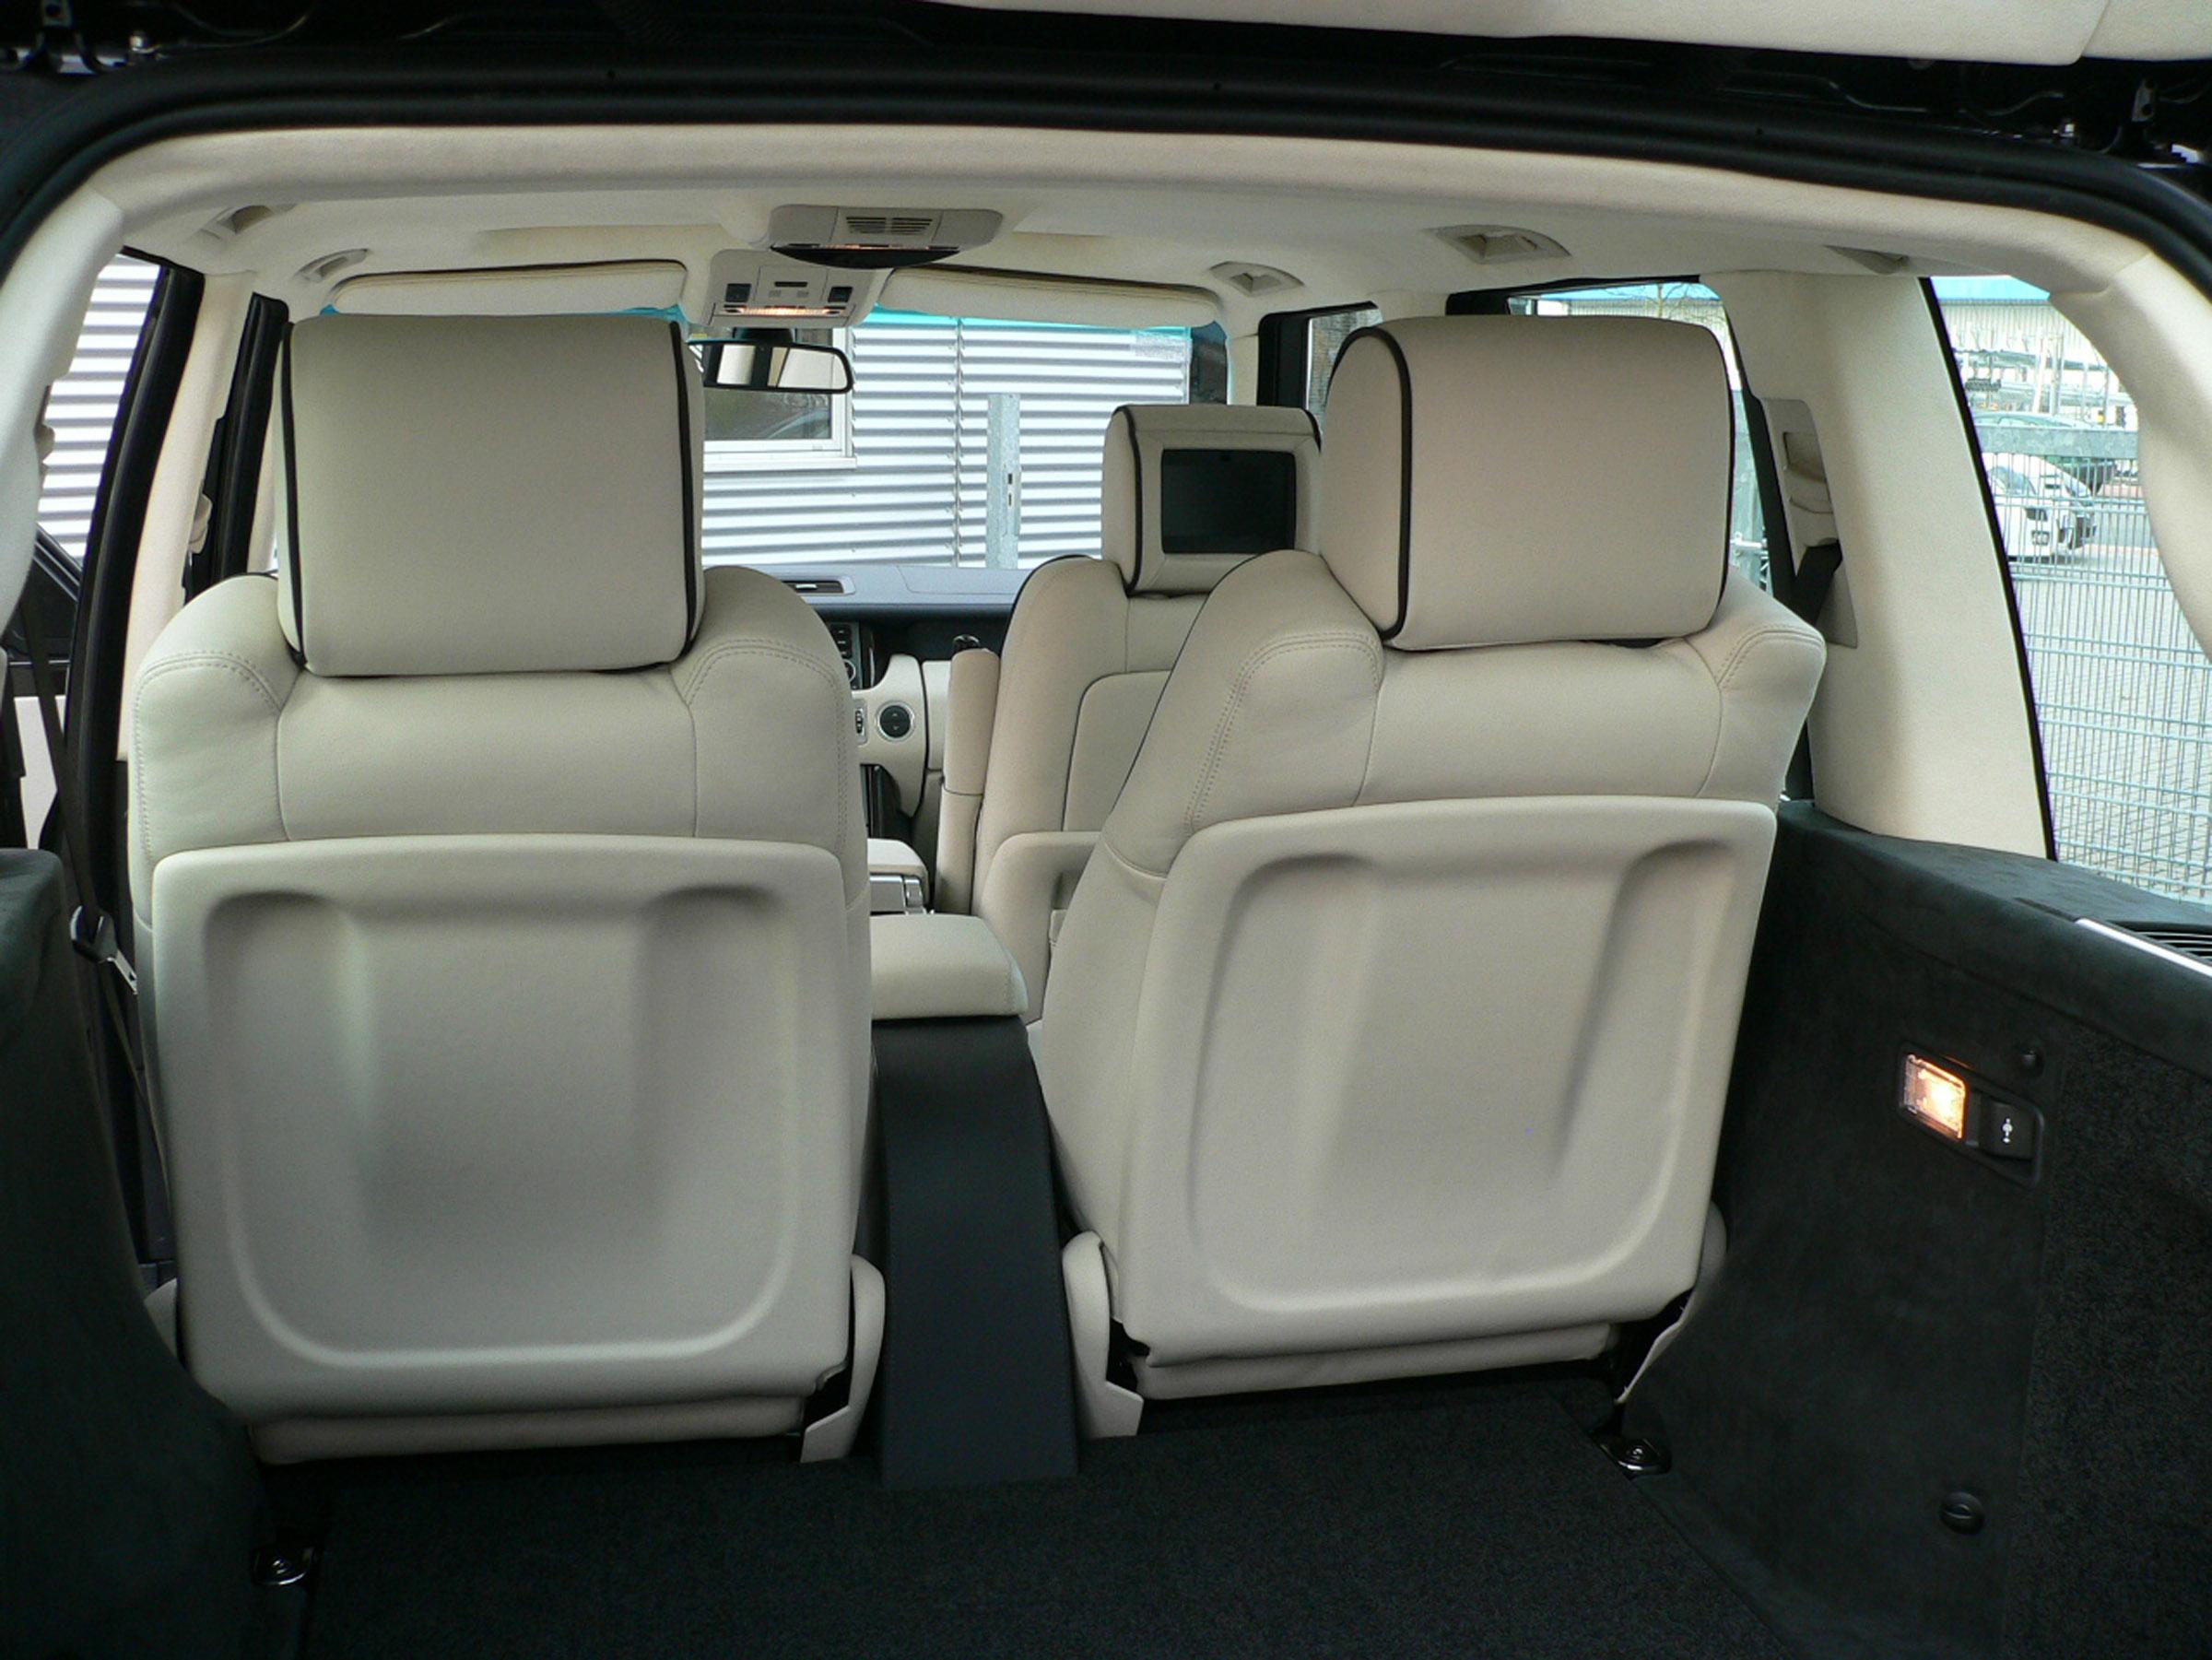 art range rover single seat system picture 27005. Black Bedroom Furniture Sets. Home Design Ideas